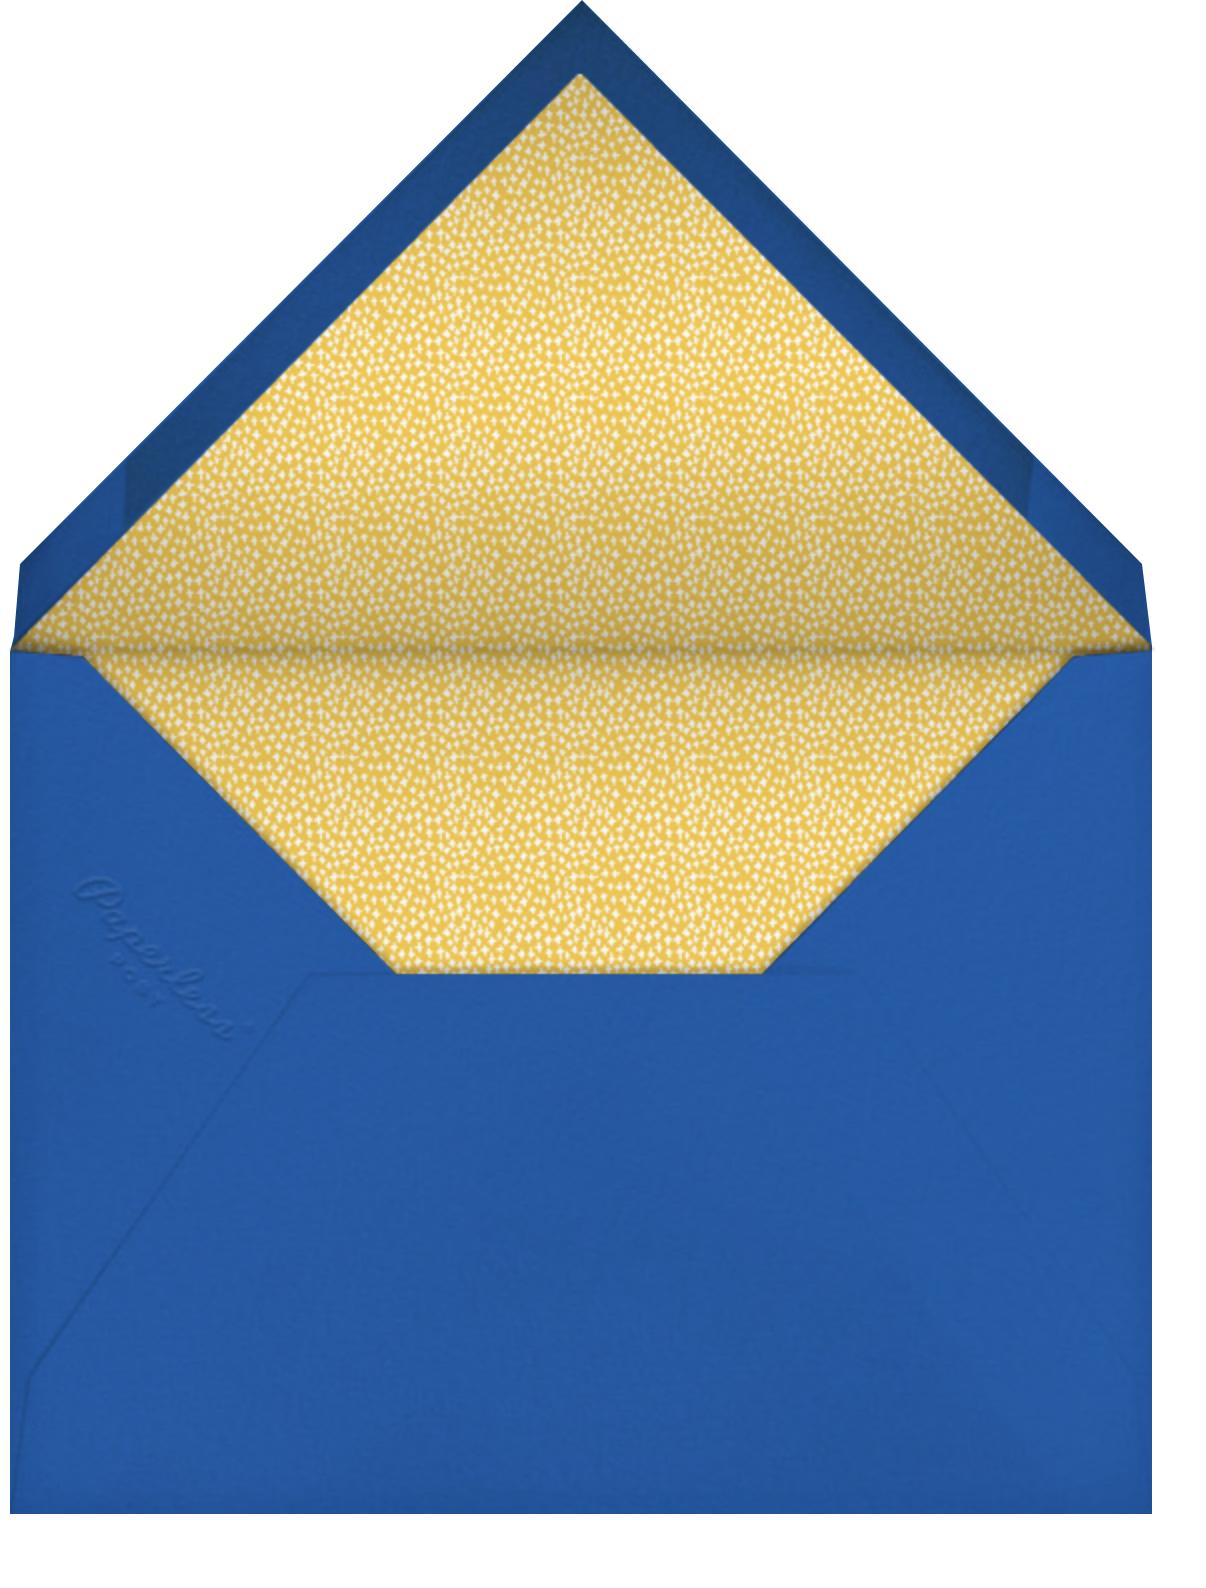 Looking Sharp - Mr. Boddington's Studio - 1st birthday - envelope back